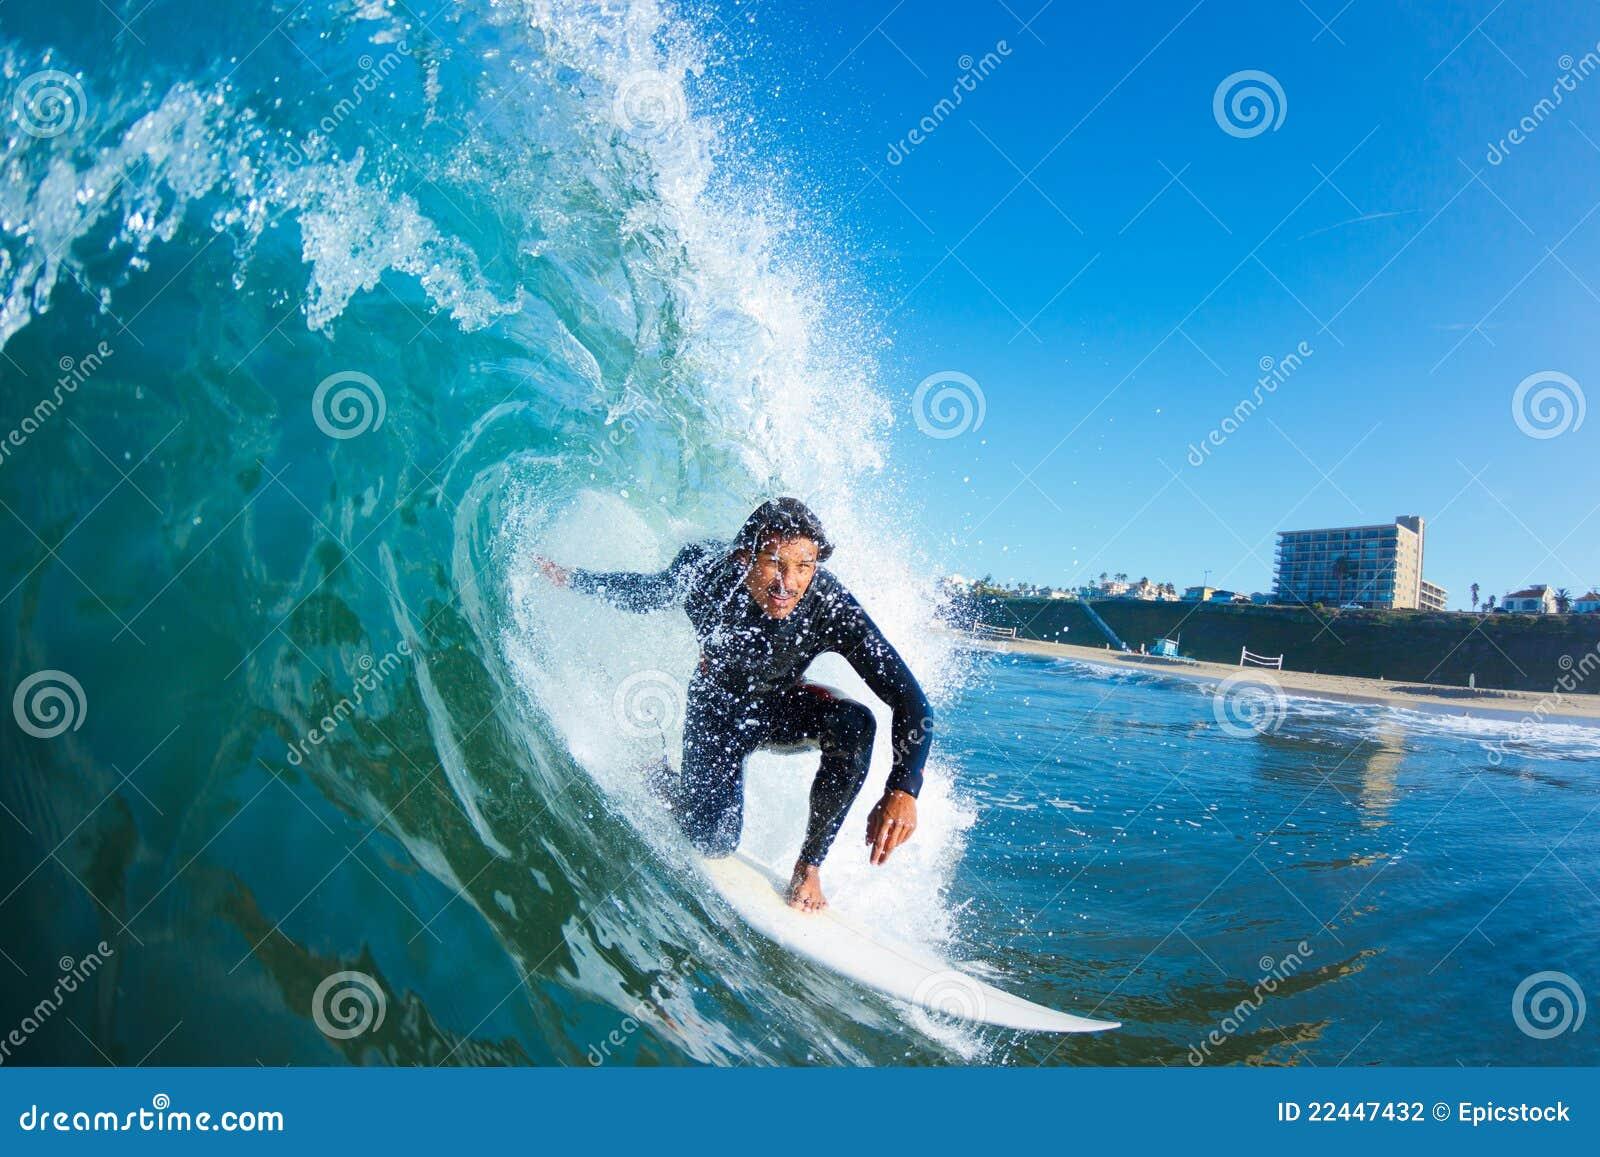 Download Surfer On Blue Ocean Wave stock photo. Image of risky - 22447432